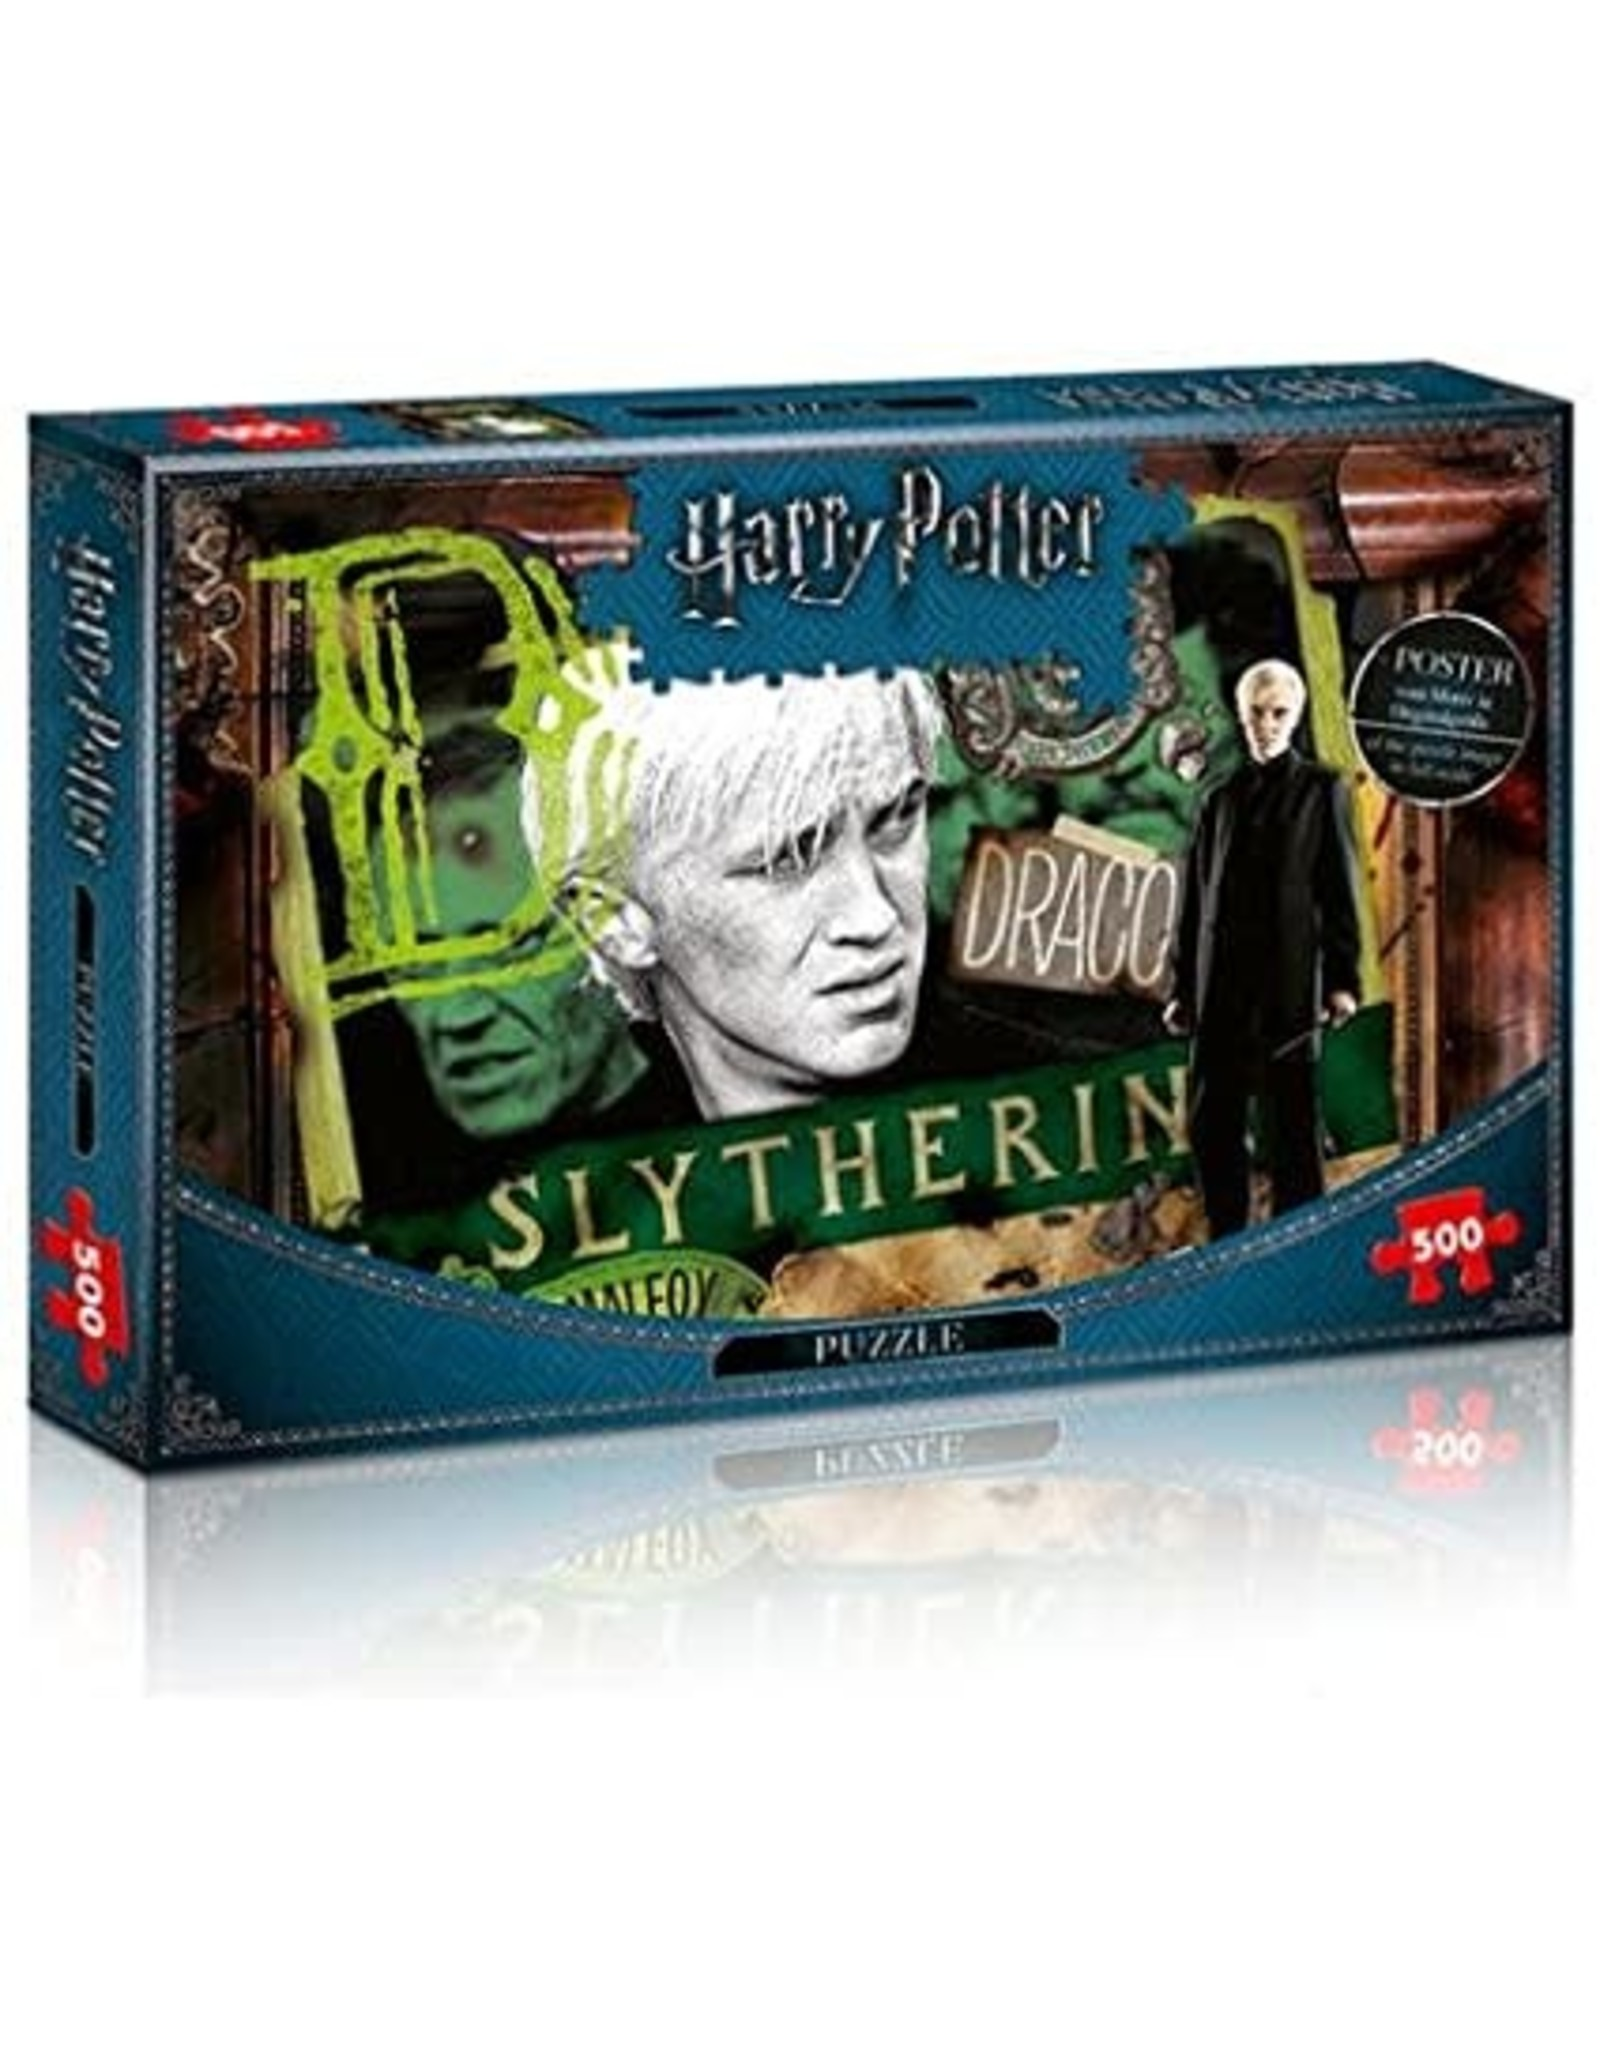 World of Harry Potter Slytherin puzzle (500)